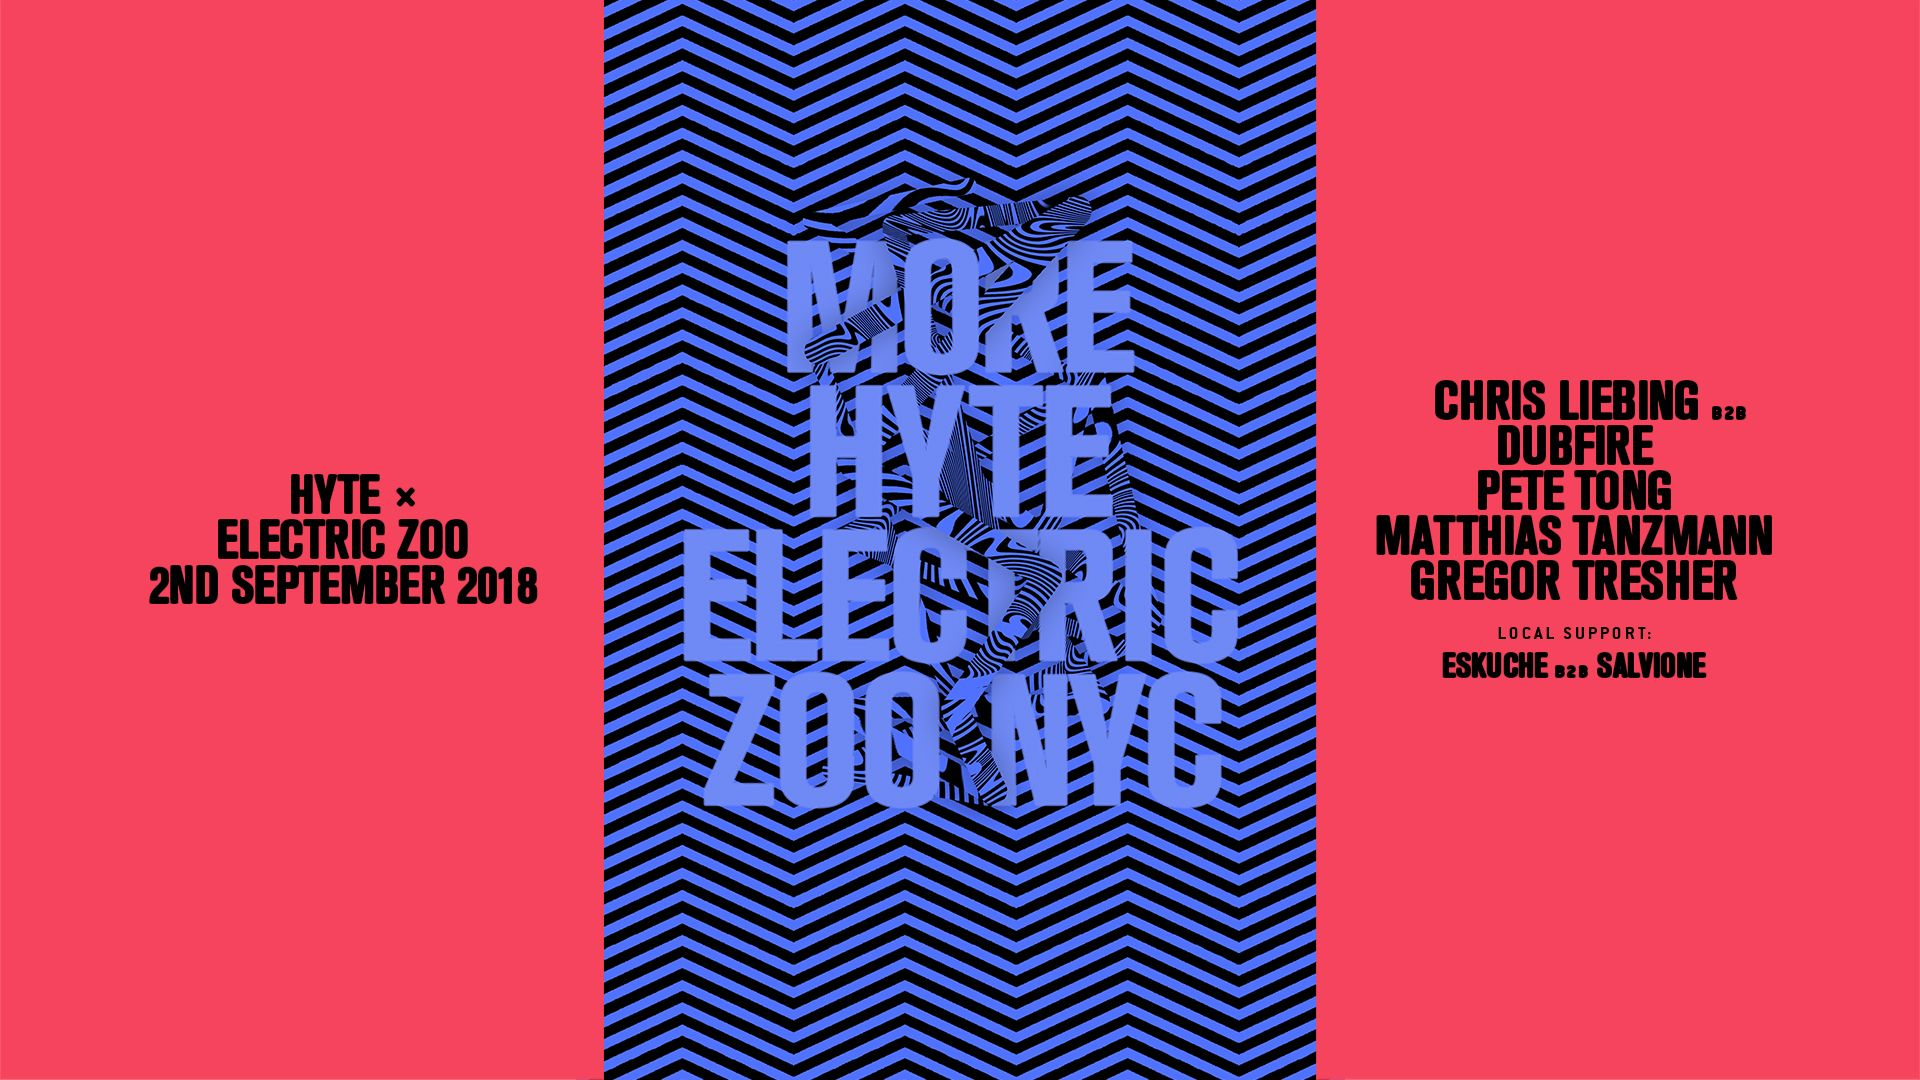 2018_hyte_nyc_full_lineup_fb_banner_1920x1080.jpg